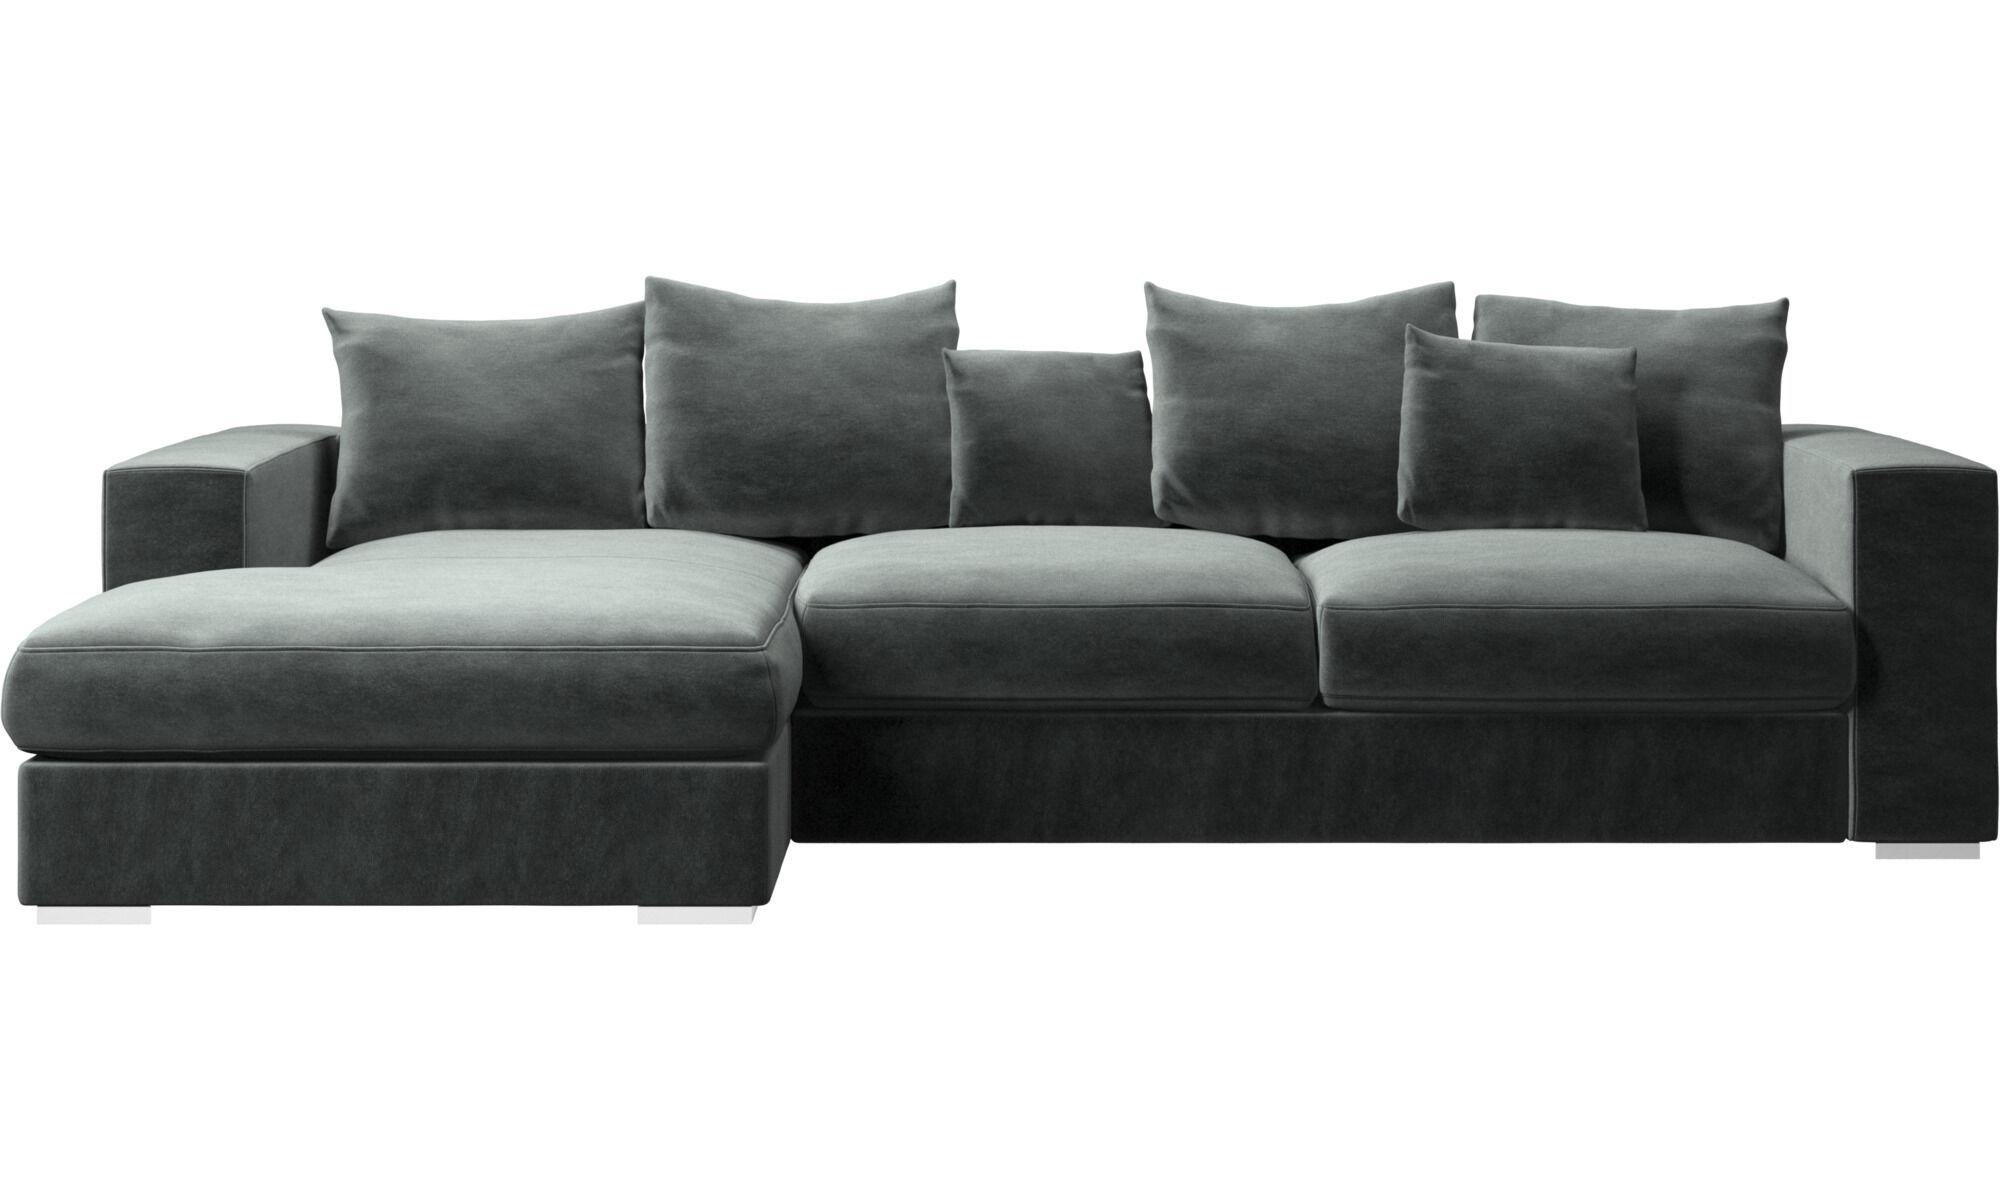 Chaise Longue Sofas   Cenova Sofa With Resting Unit   Green   Fabric ...